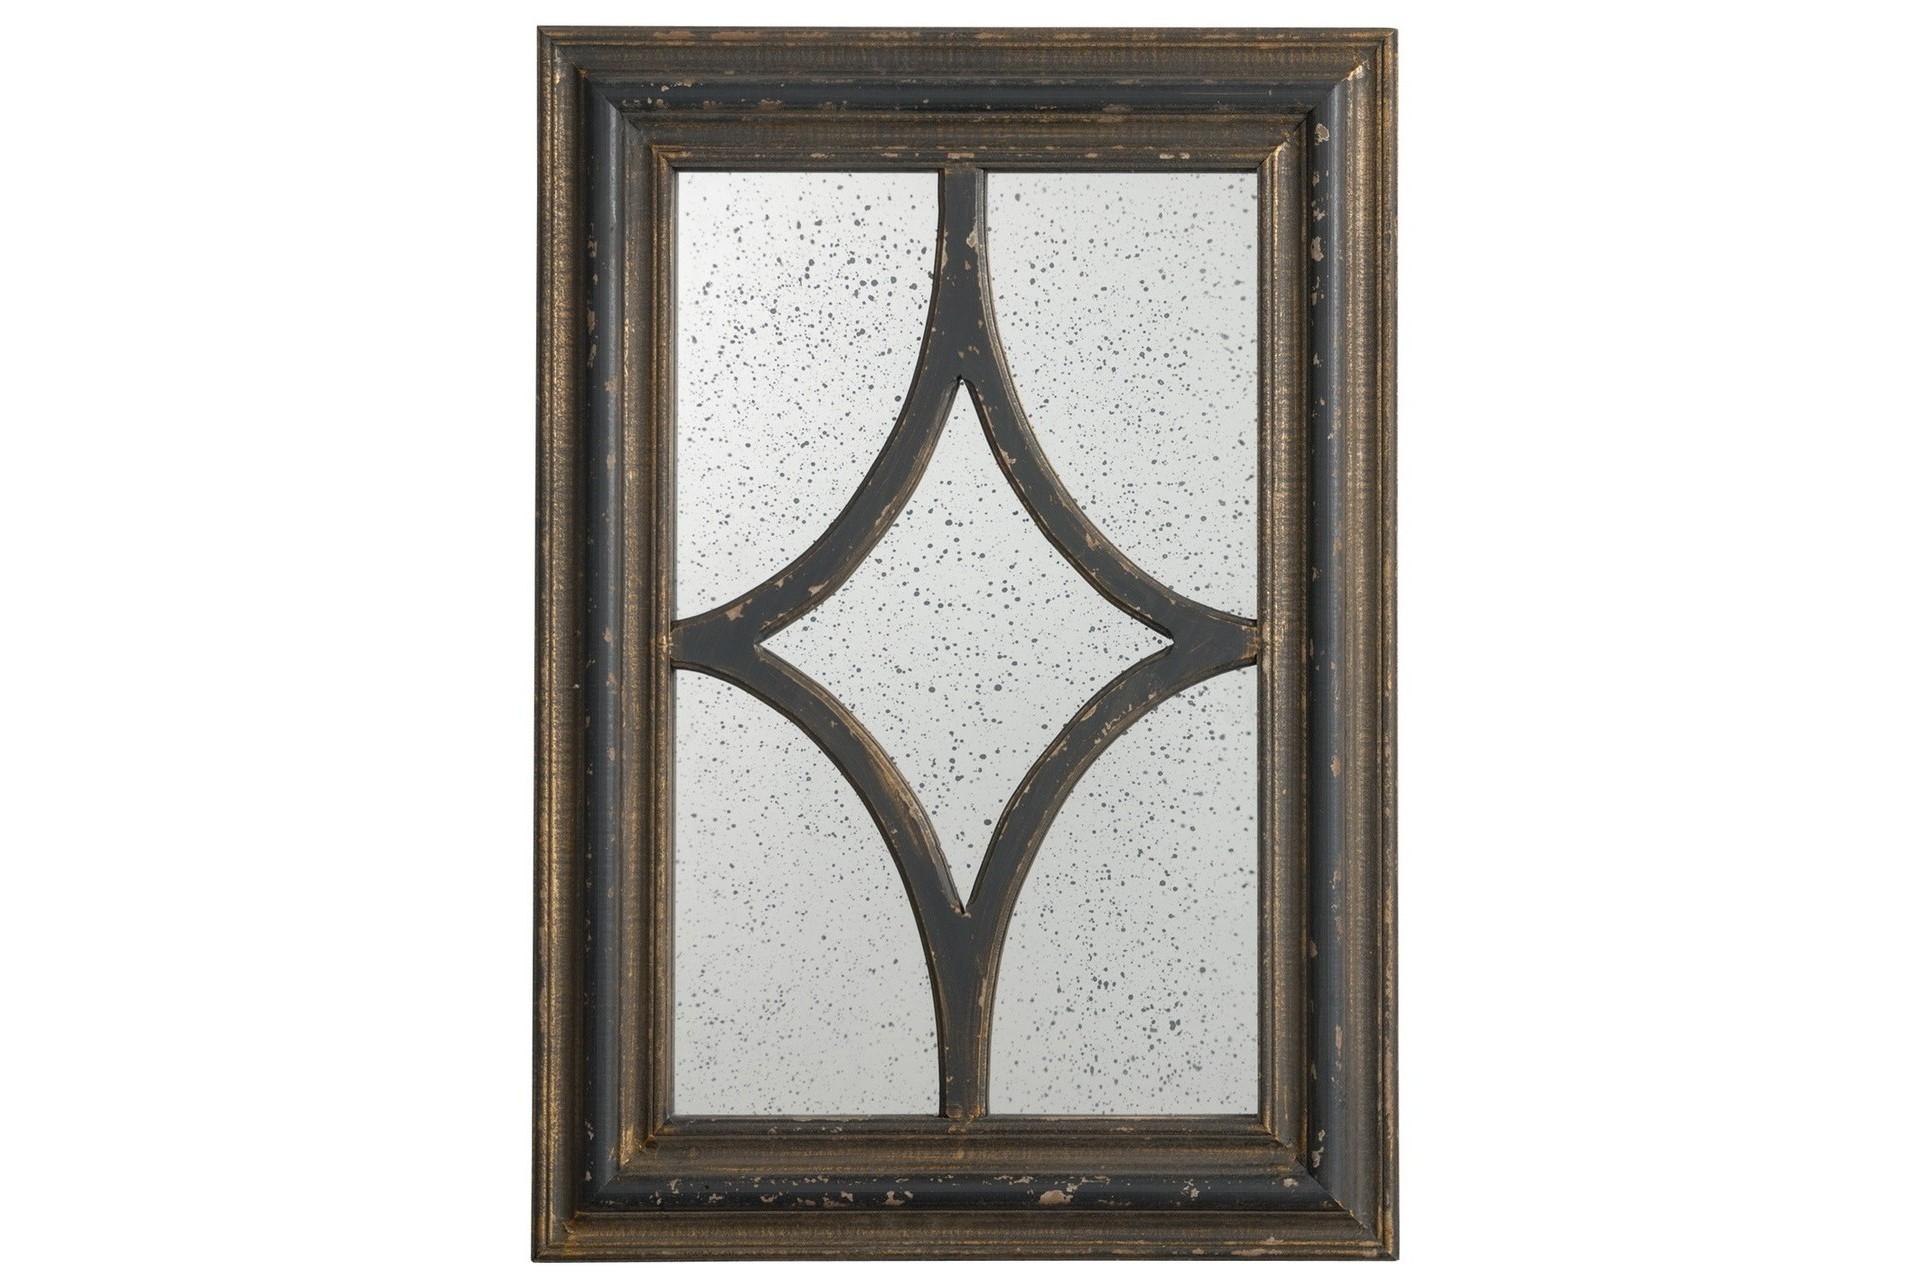 ЗеркалоНастенные зеркала<br><br><br>Material: Дерево<br>Ширина см: 50<br>Высота см: 70<br>Глубина см: 2